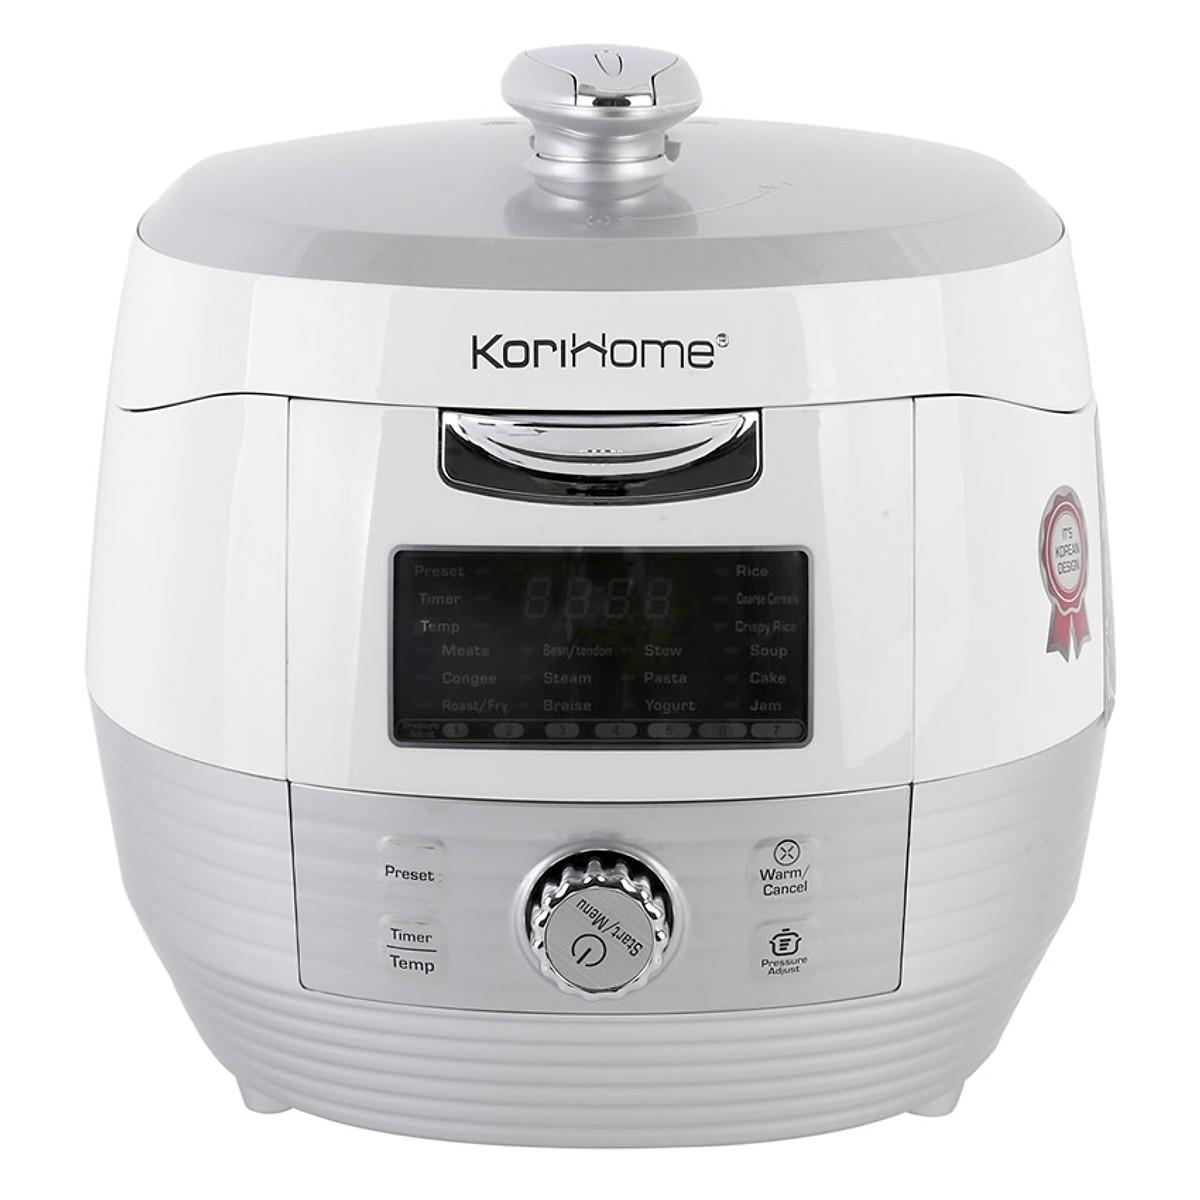 Nồi áp suất đa năng Korihome PCK 588